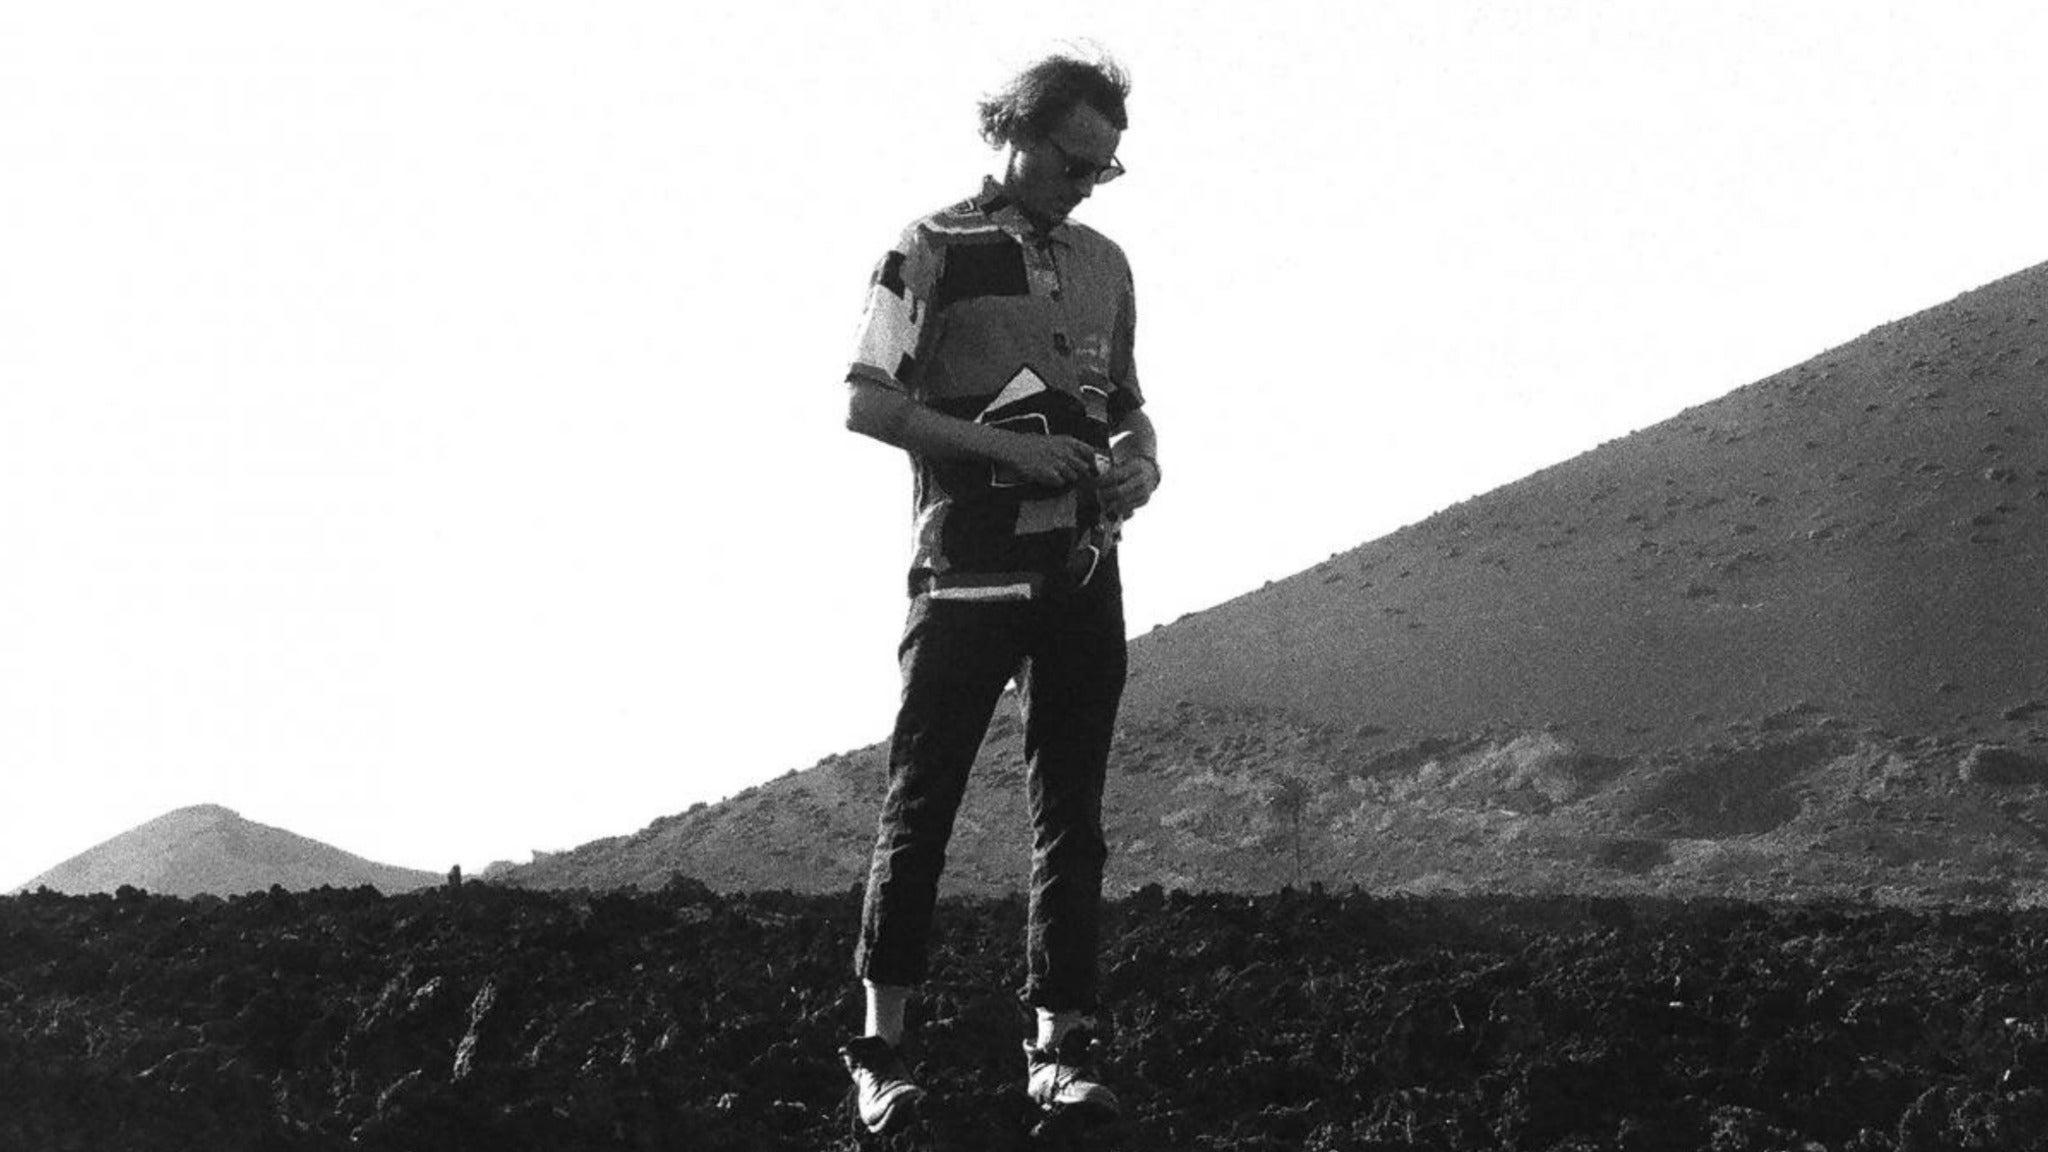 Ben Howard at Red Rocks Amphitheatre